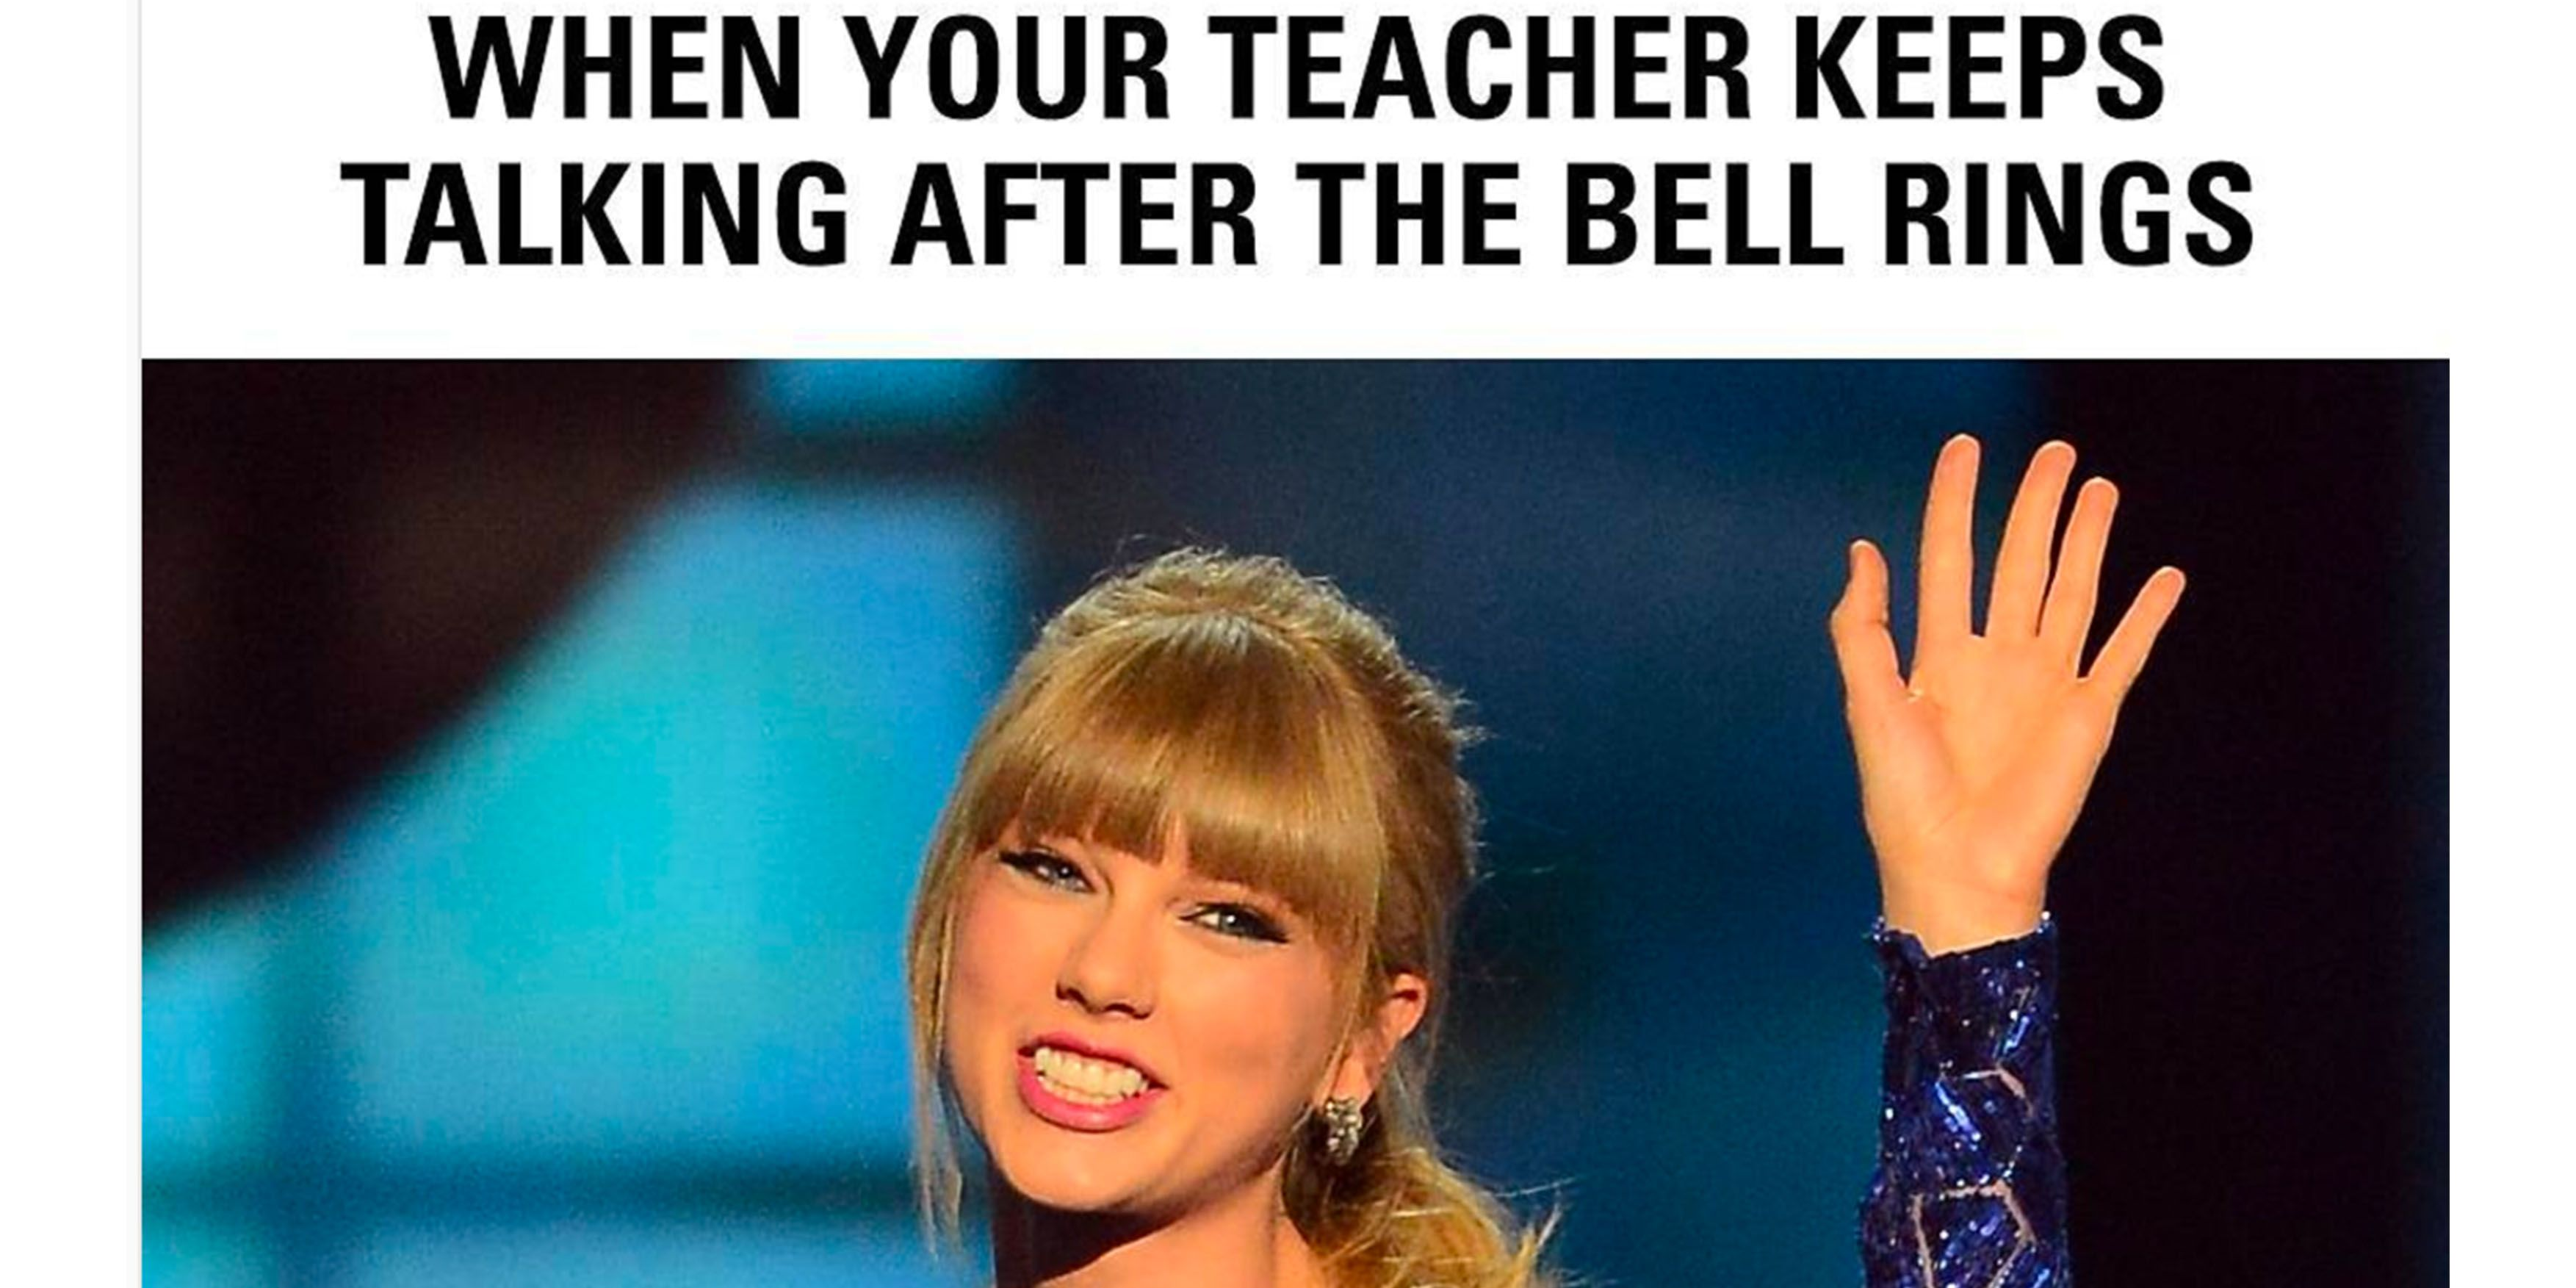 16 funniest teacher memes 2018 relatable memes about students and teachers